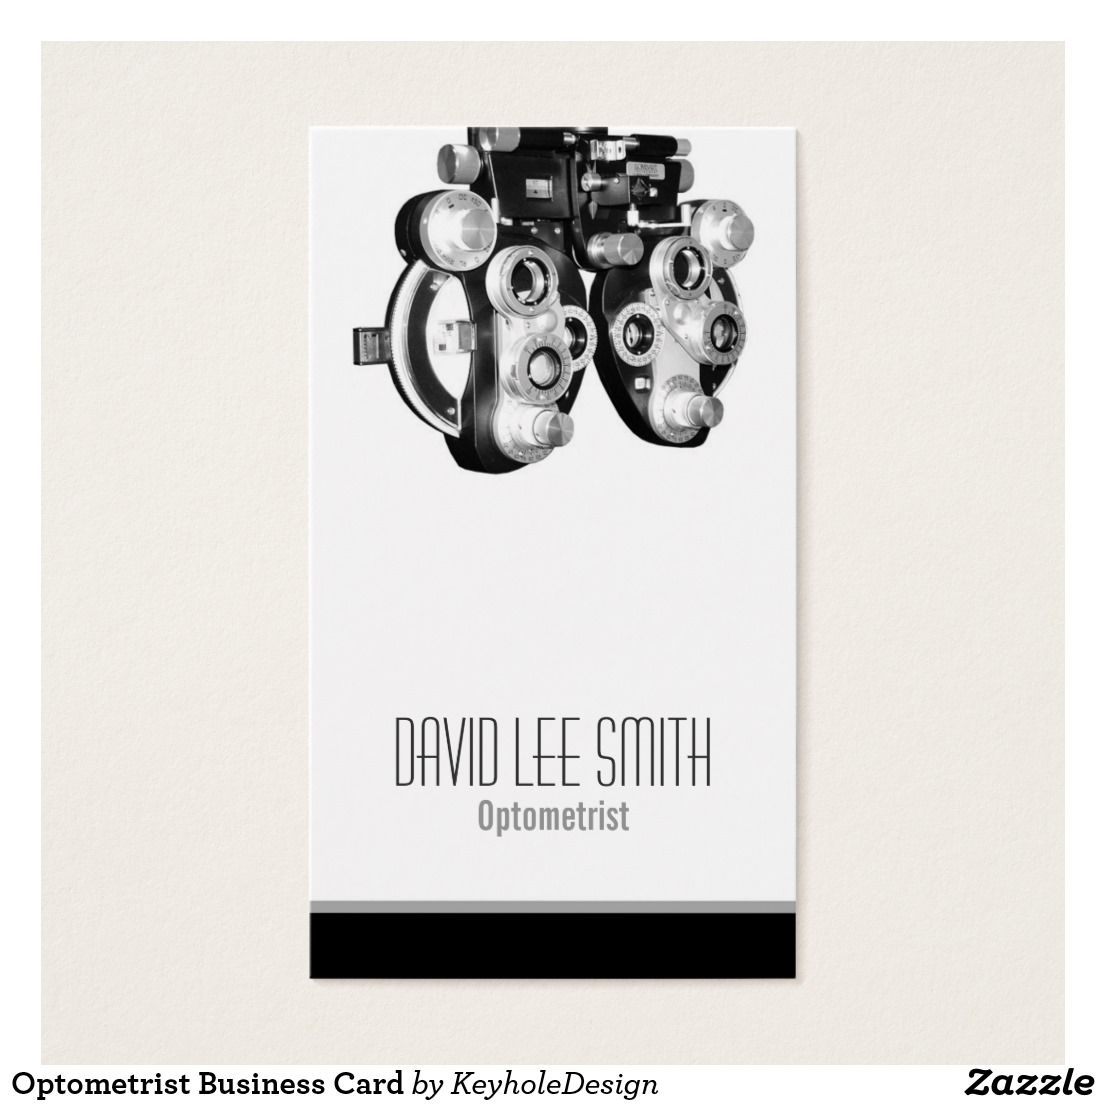 Optometrist Business Card | Business